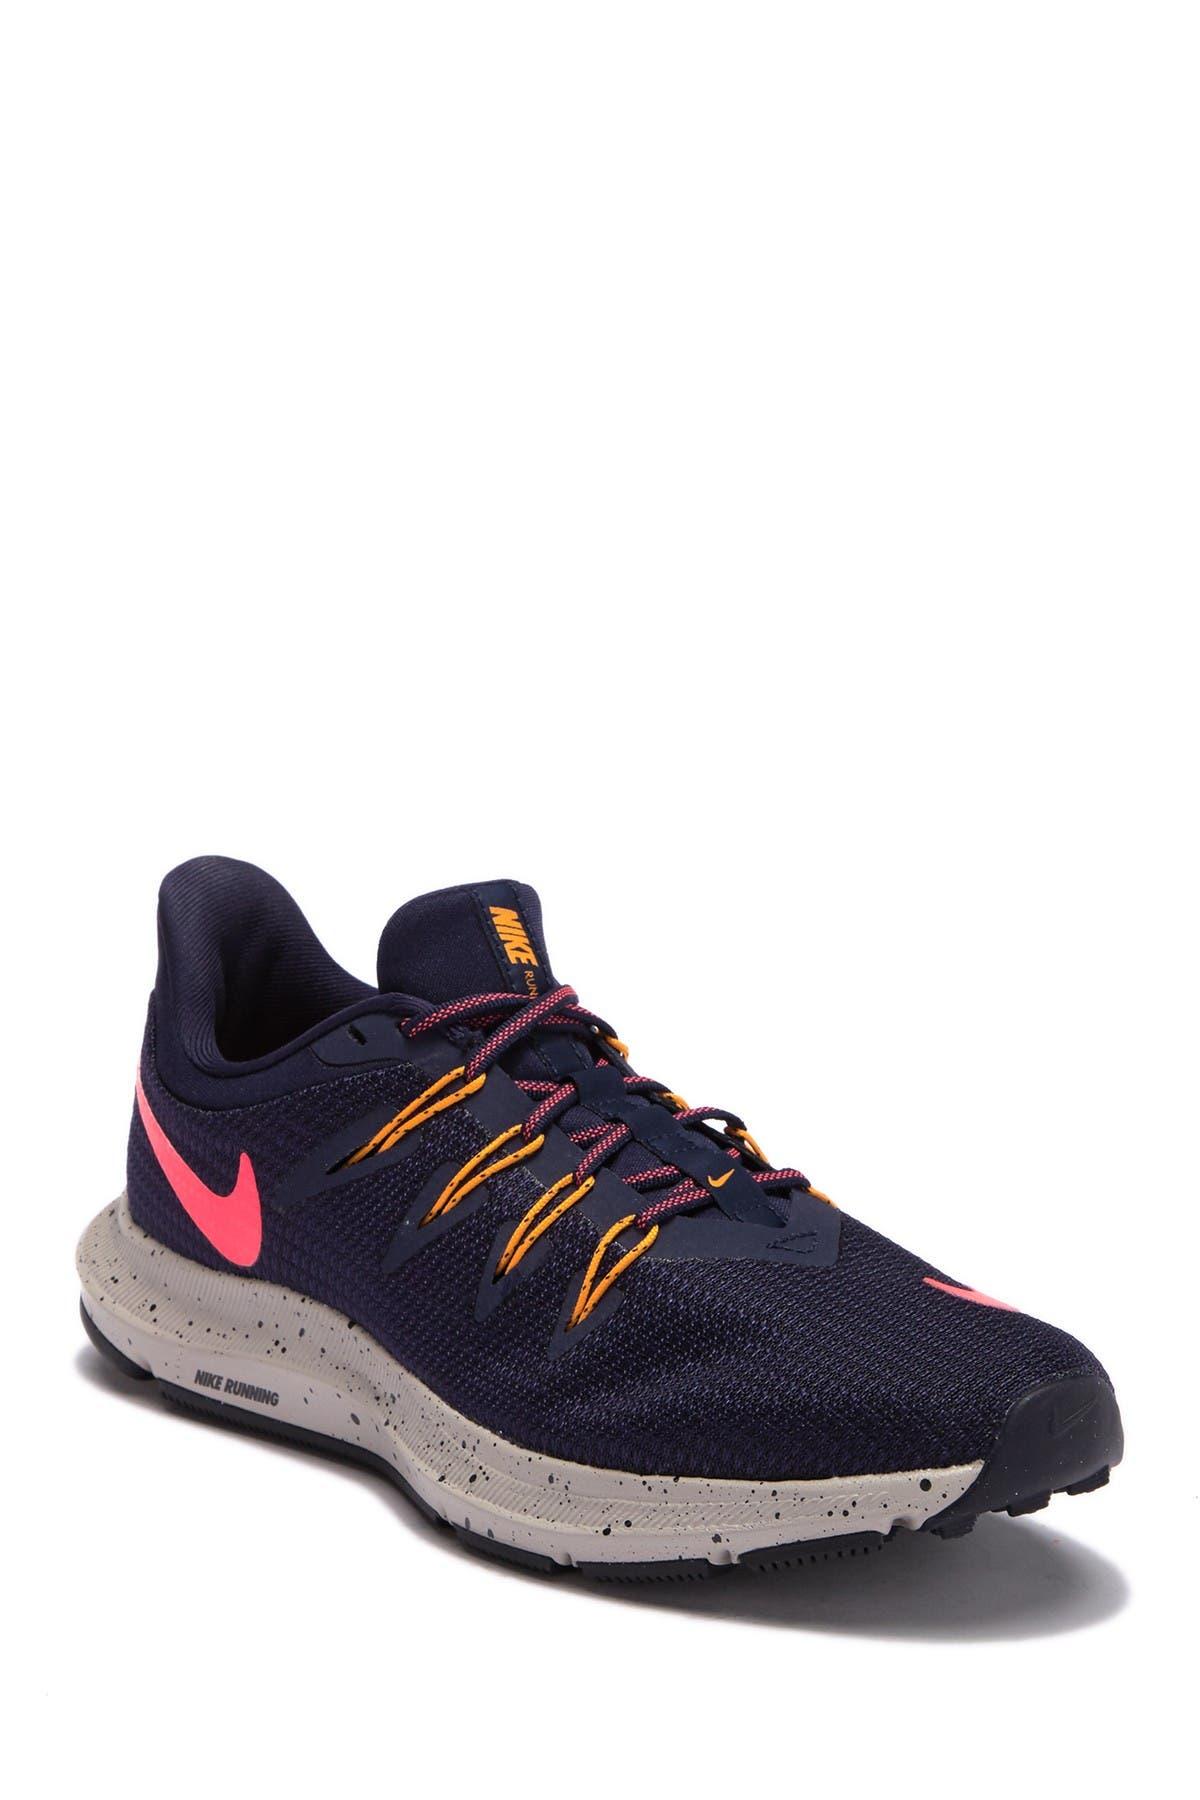 Nike | Quest SE Running Sneaker